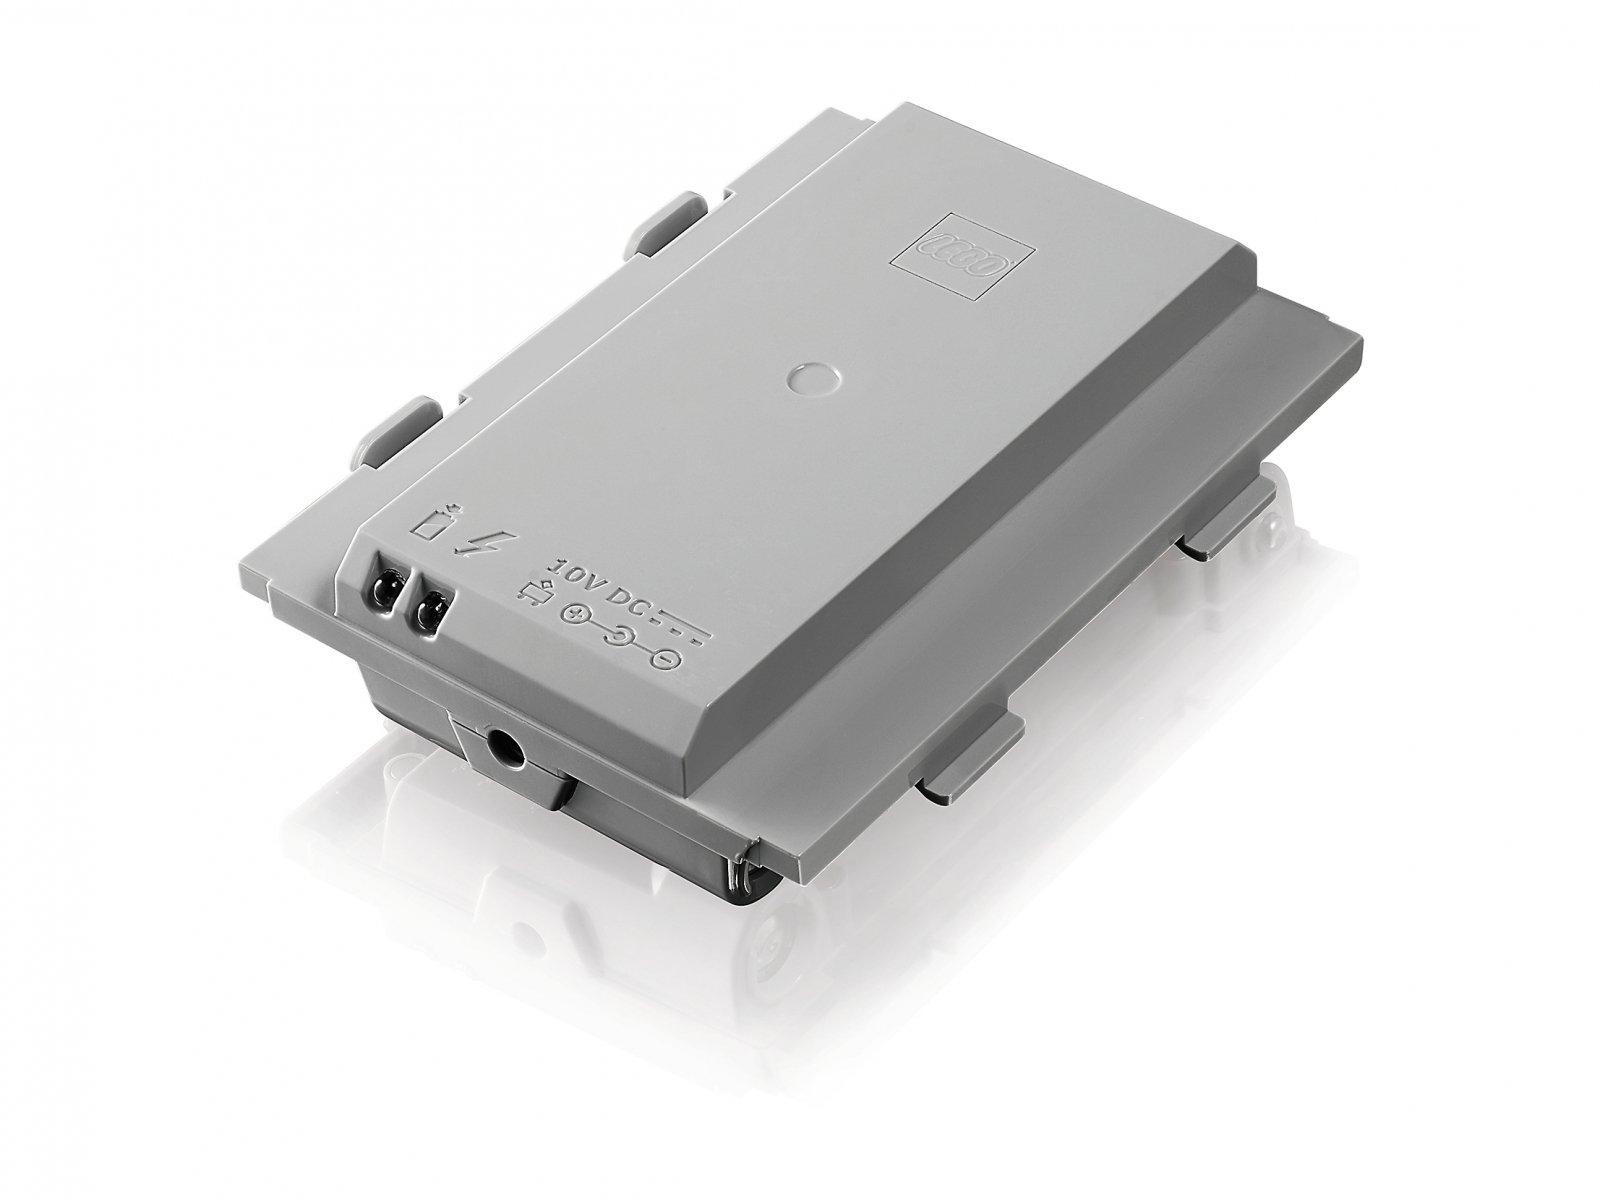 LEGO Mindstorms Akumulator na prąd stały EV3 45501